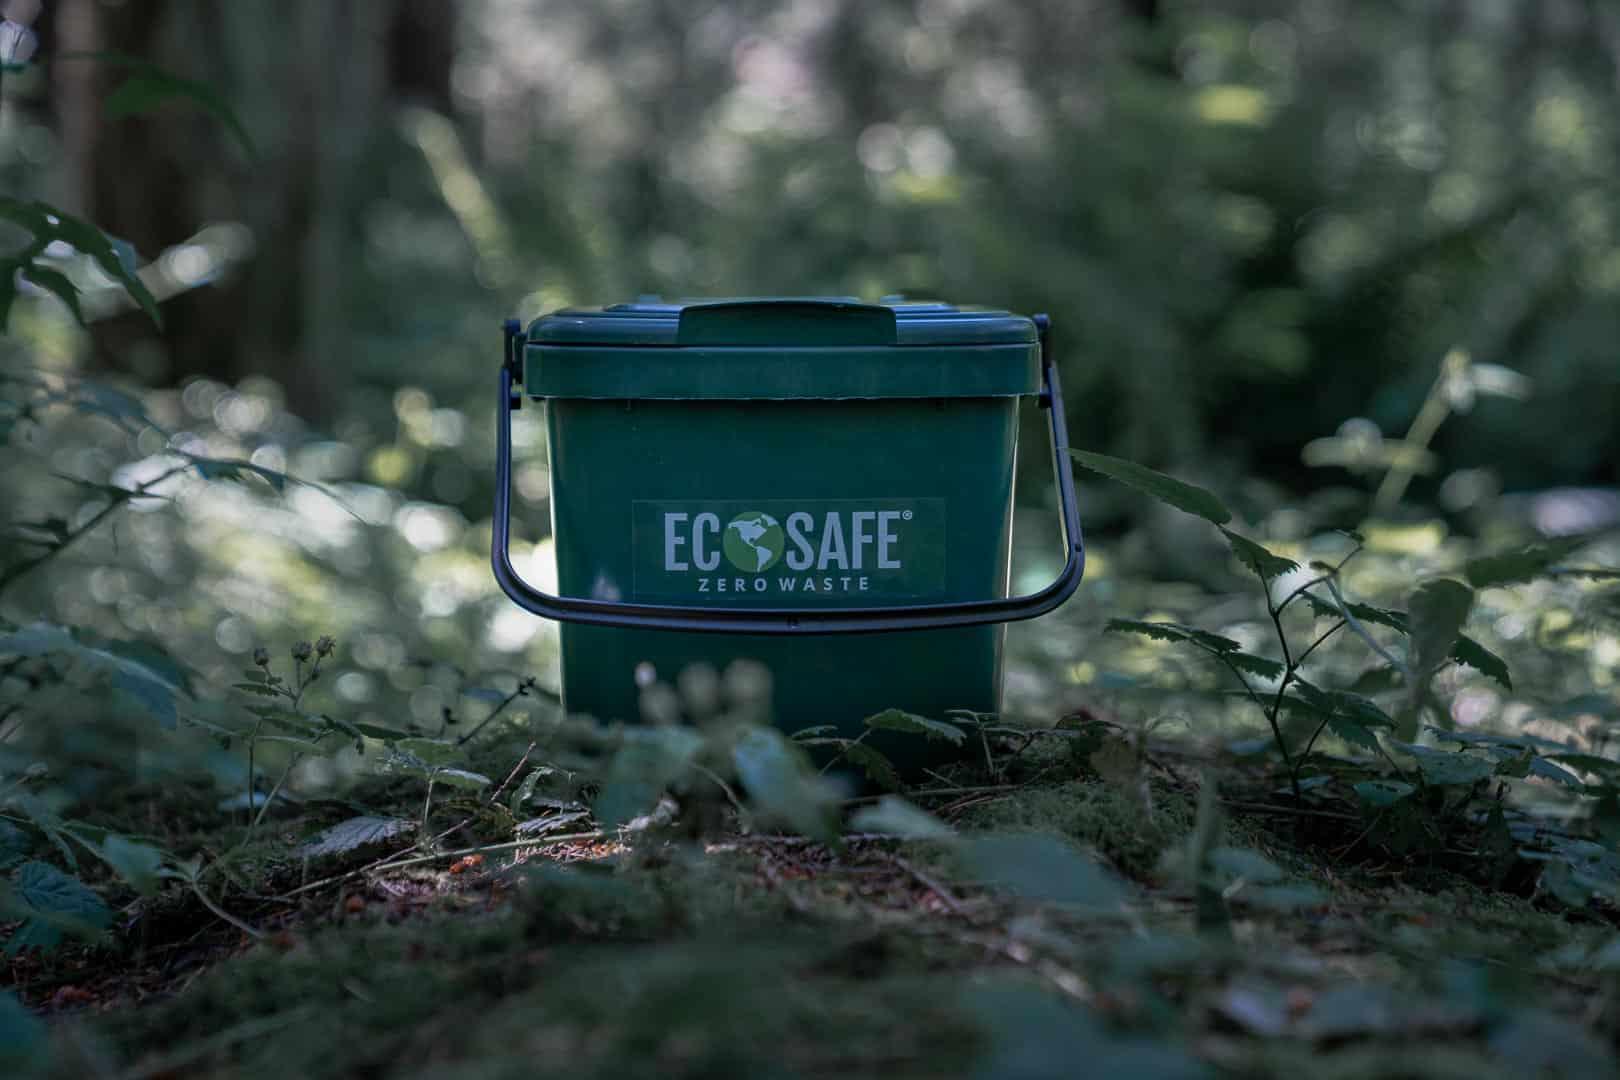 Ecosafe Green   Zero waste - compost bin